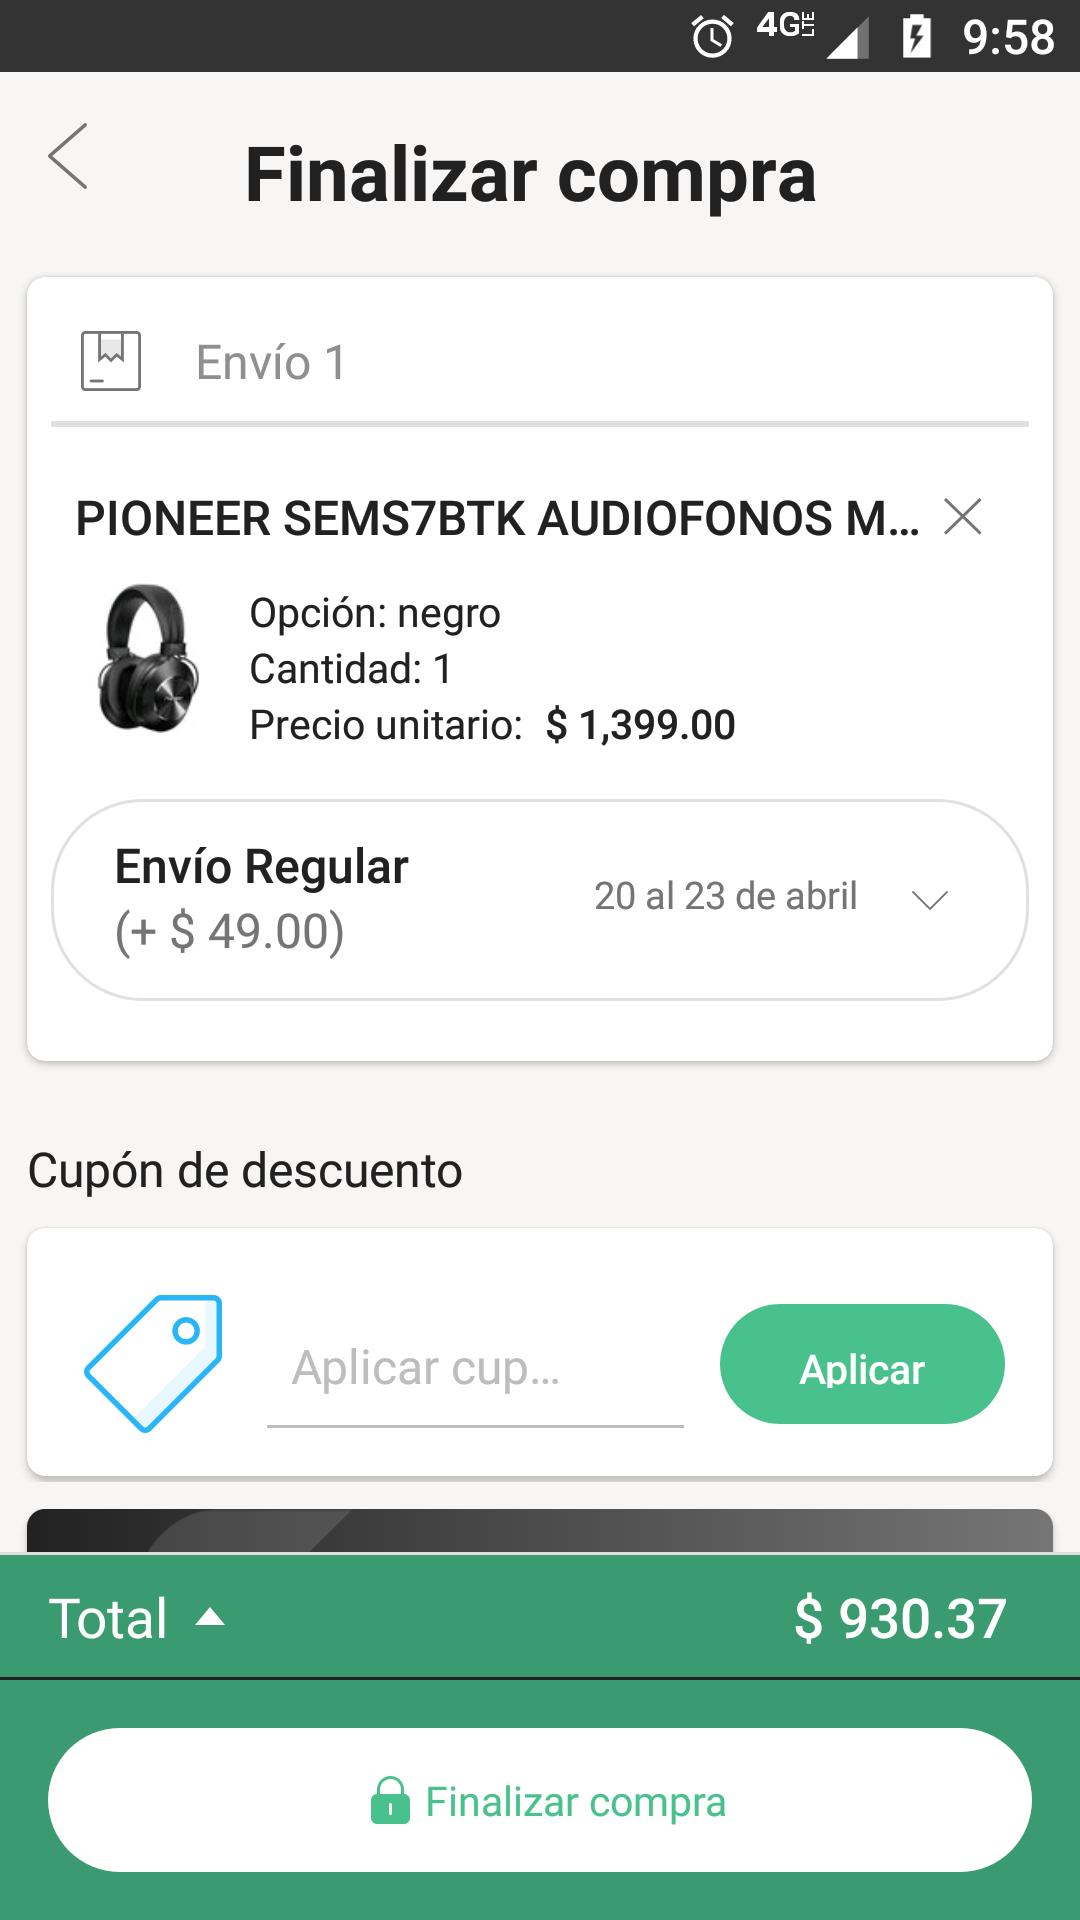 Linio: Audífonos Pioneer SEMS7BTK